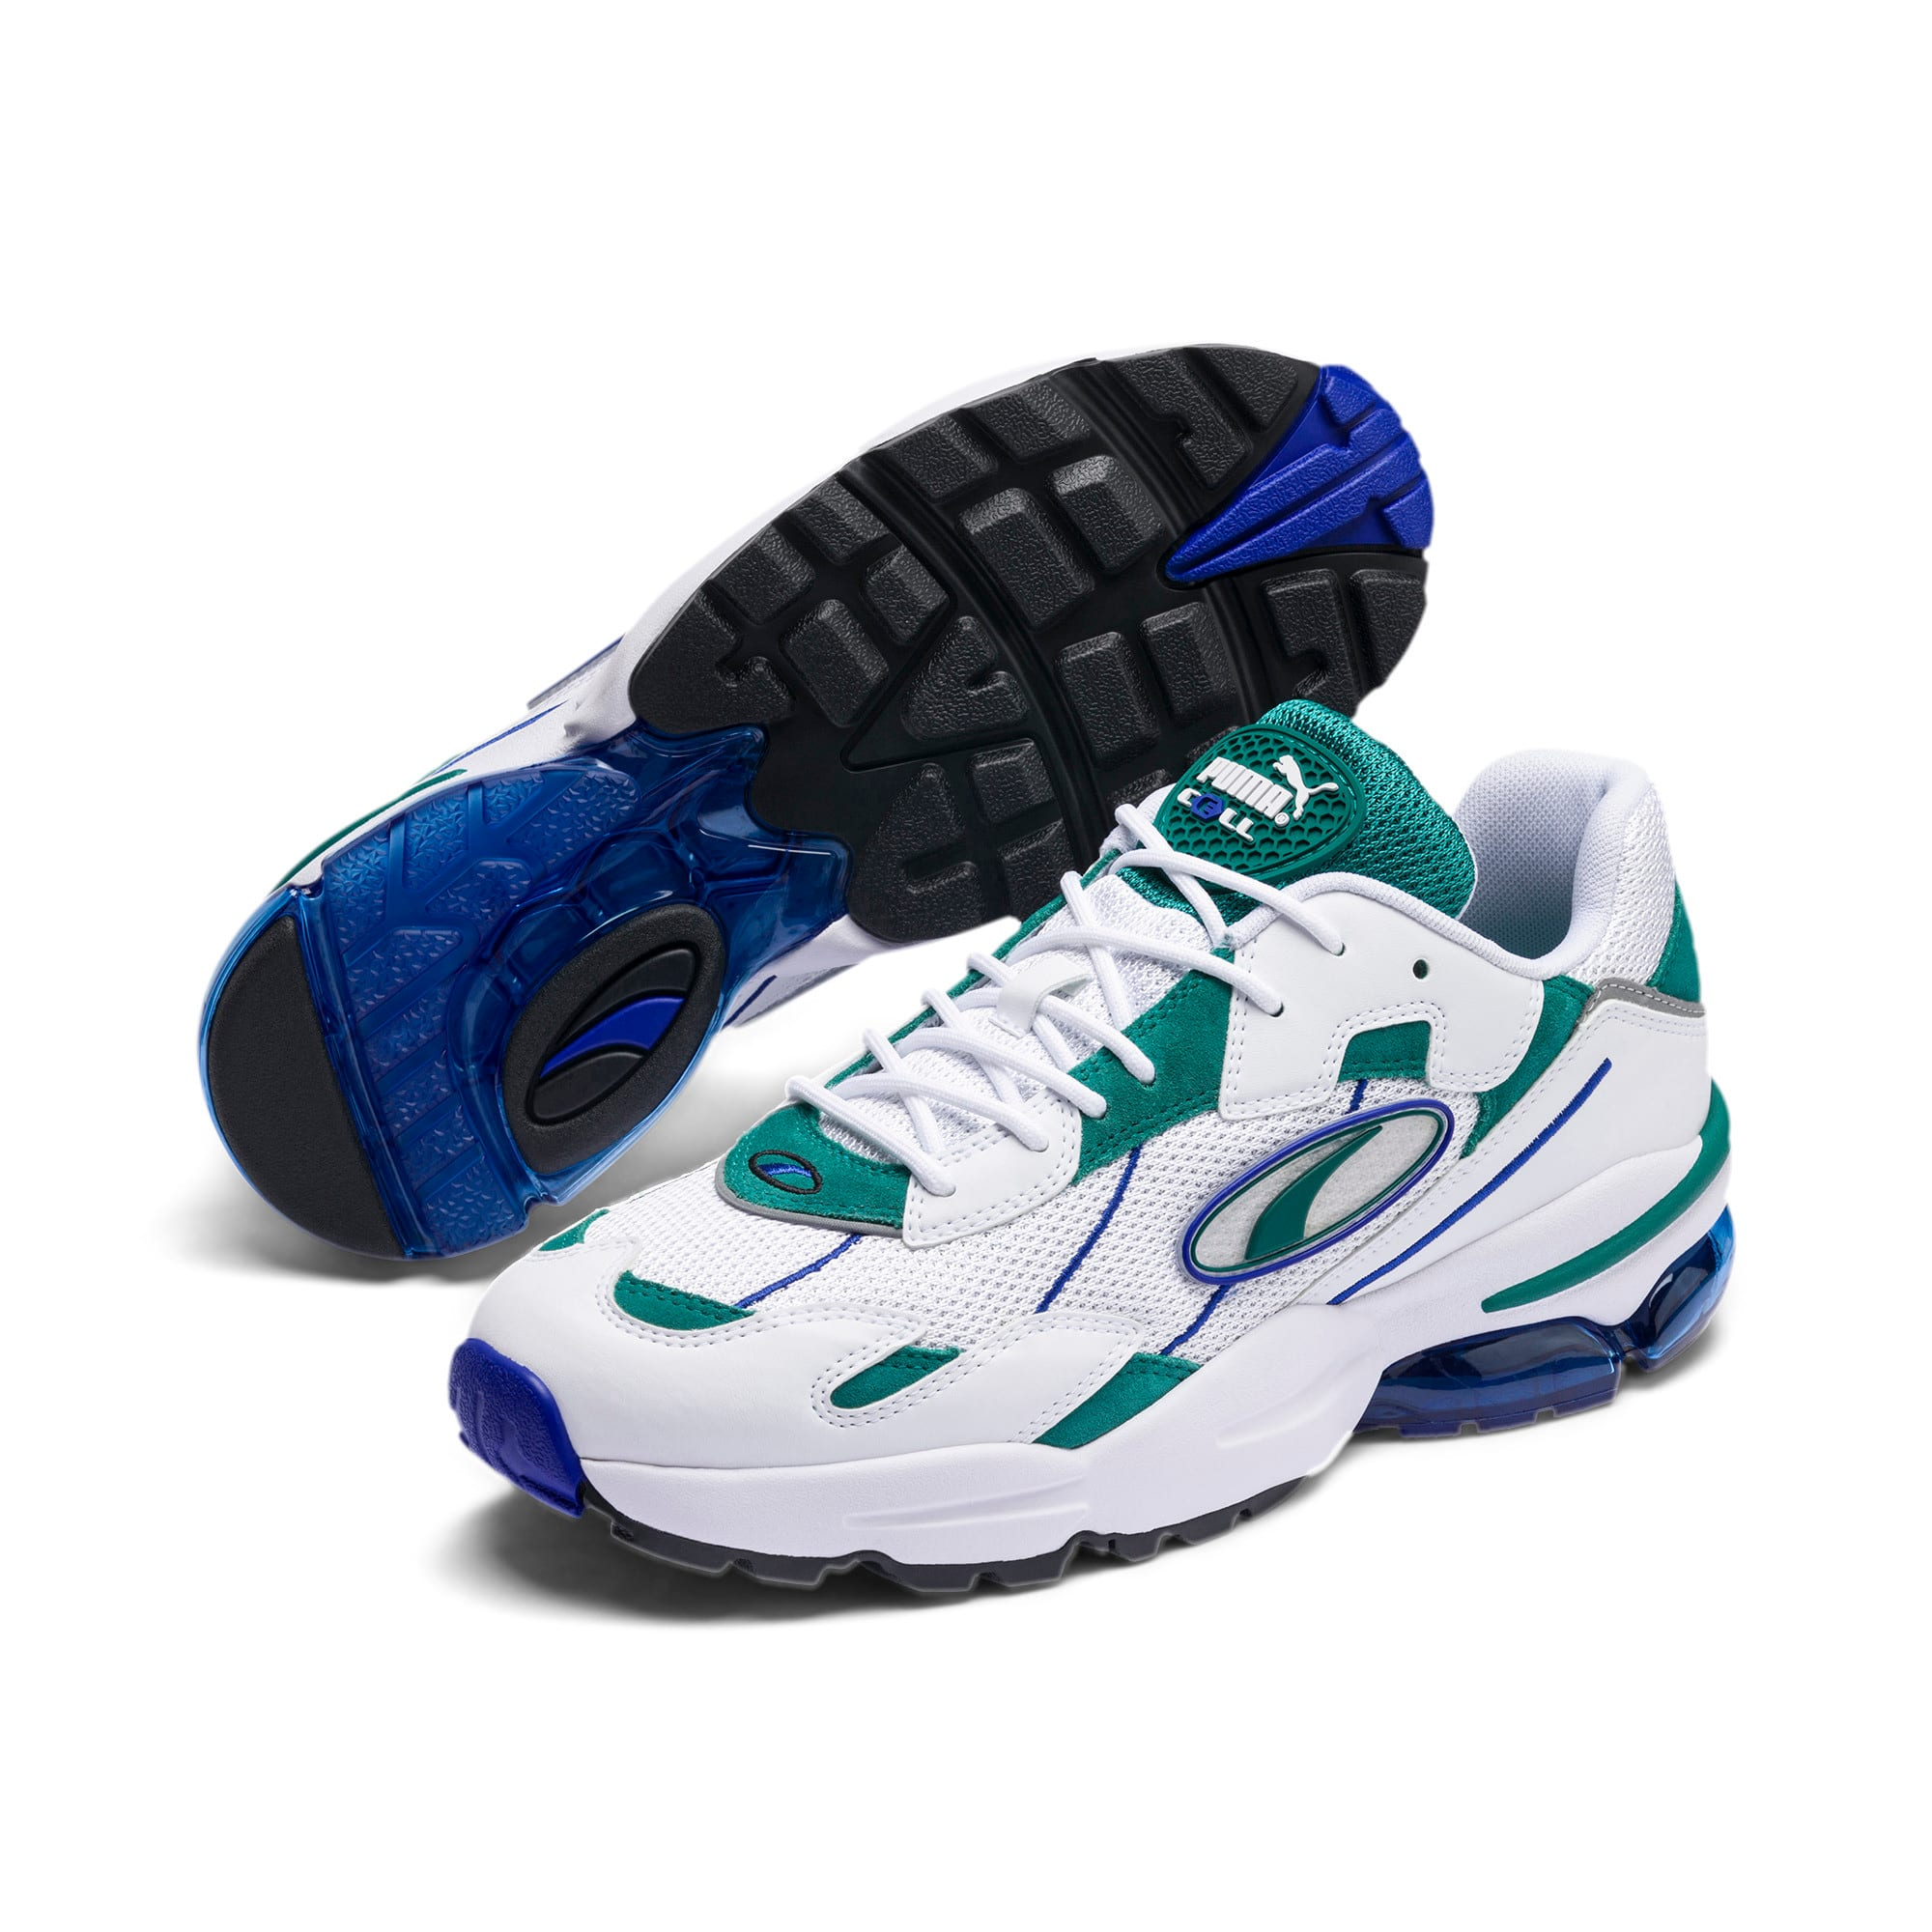 Thumbnail 3 of CELL Ultra OG Pack Sneakers, Puma White-Teal Green, medium